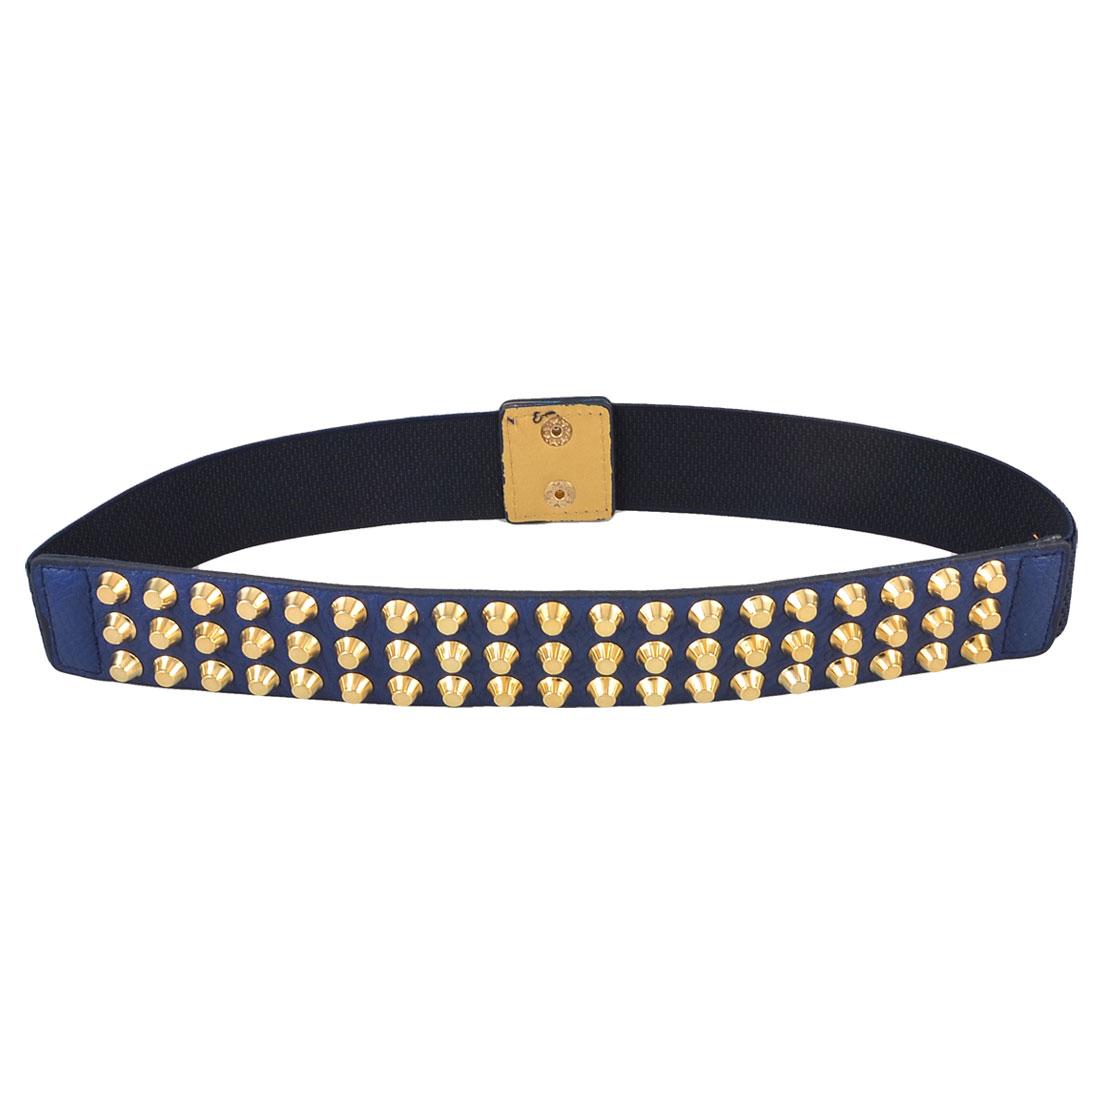 Dark Blue Gold Tone Studs Decor Press Stud Button Stretch Waist Belt for Lady